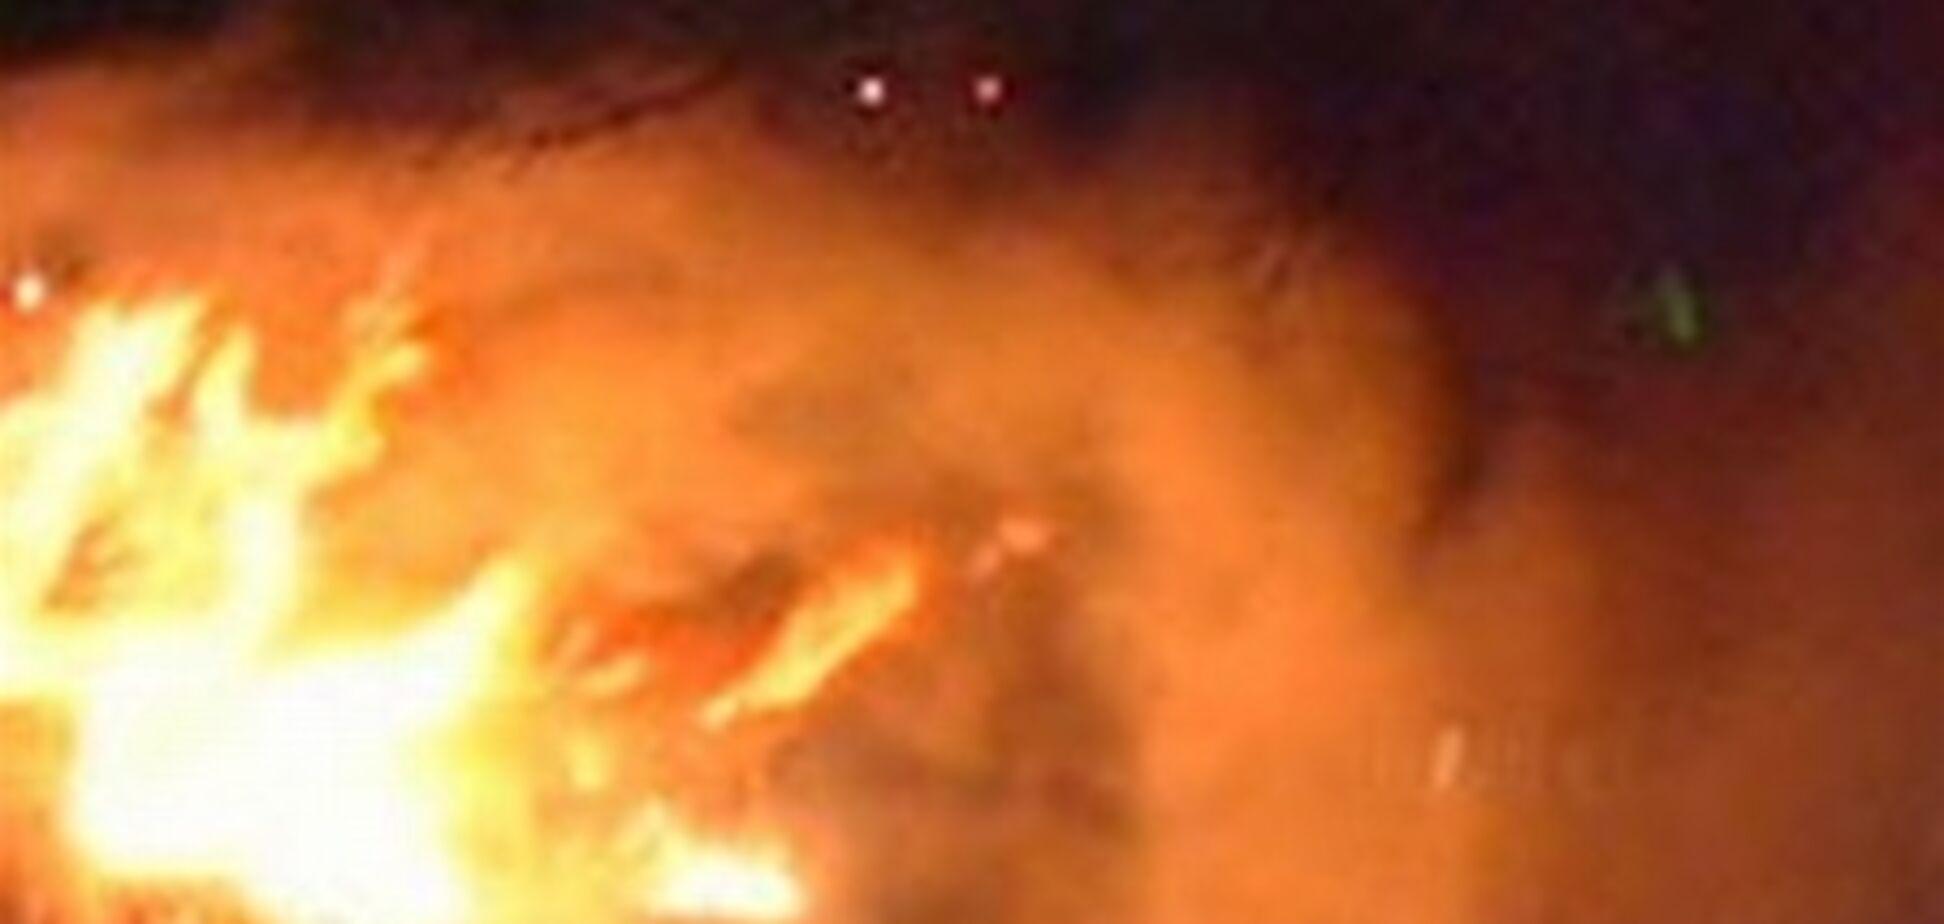 На Русановке незаконно поджигают дома